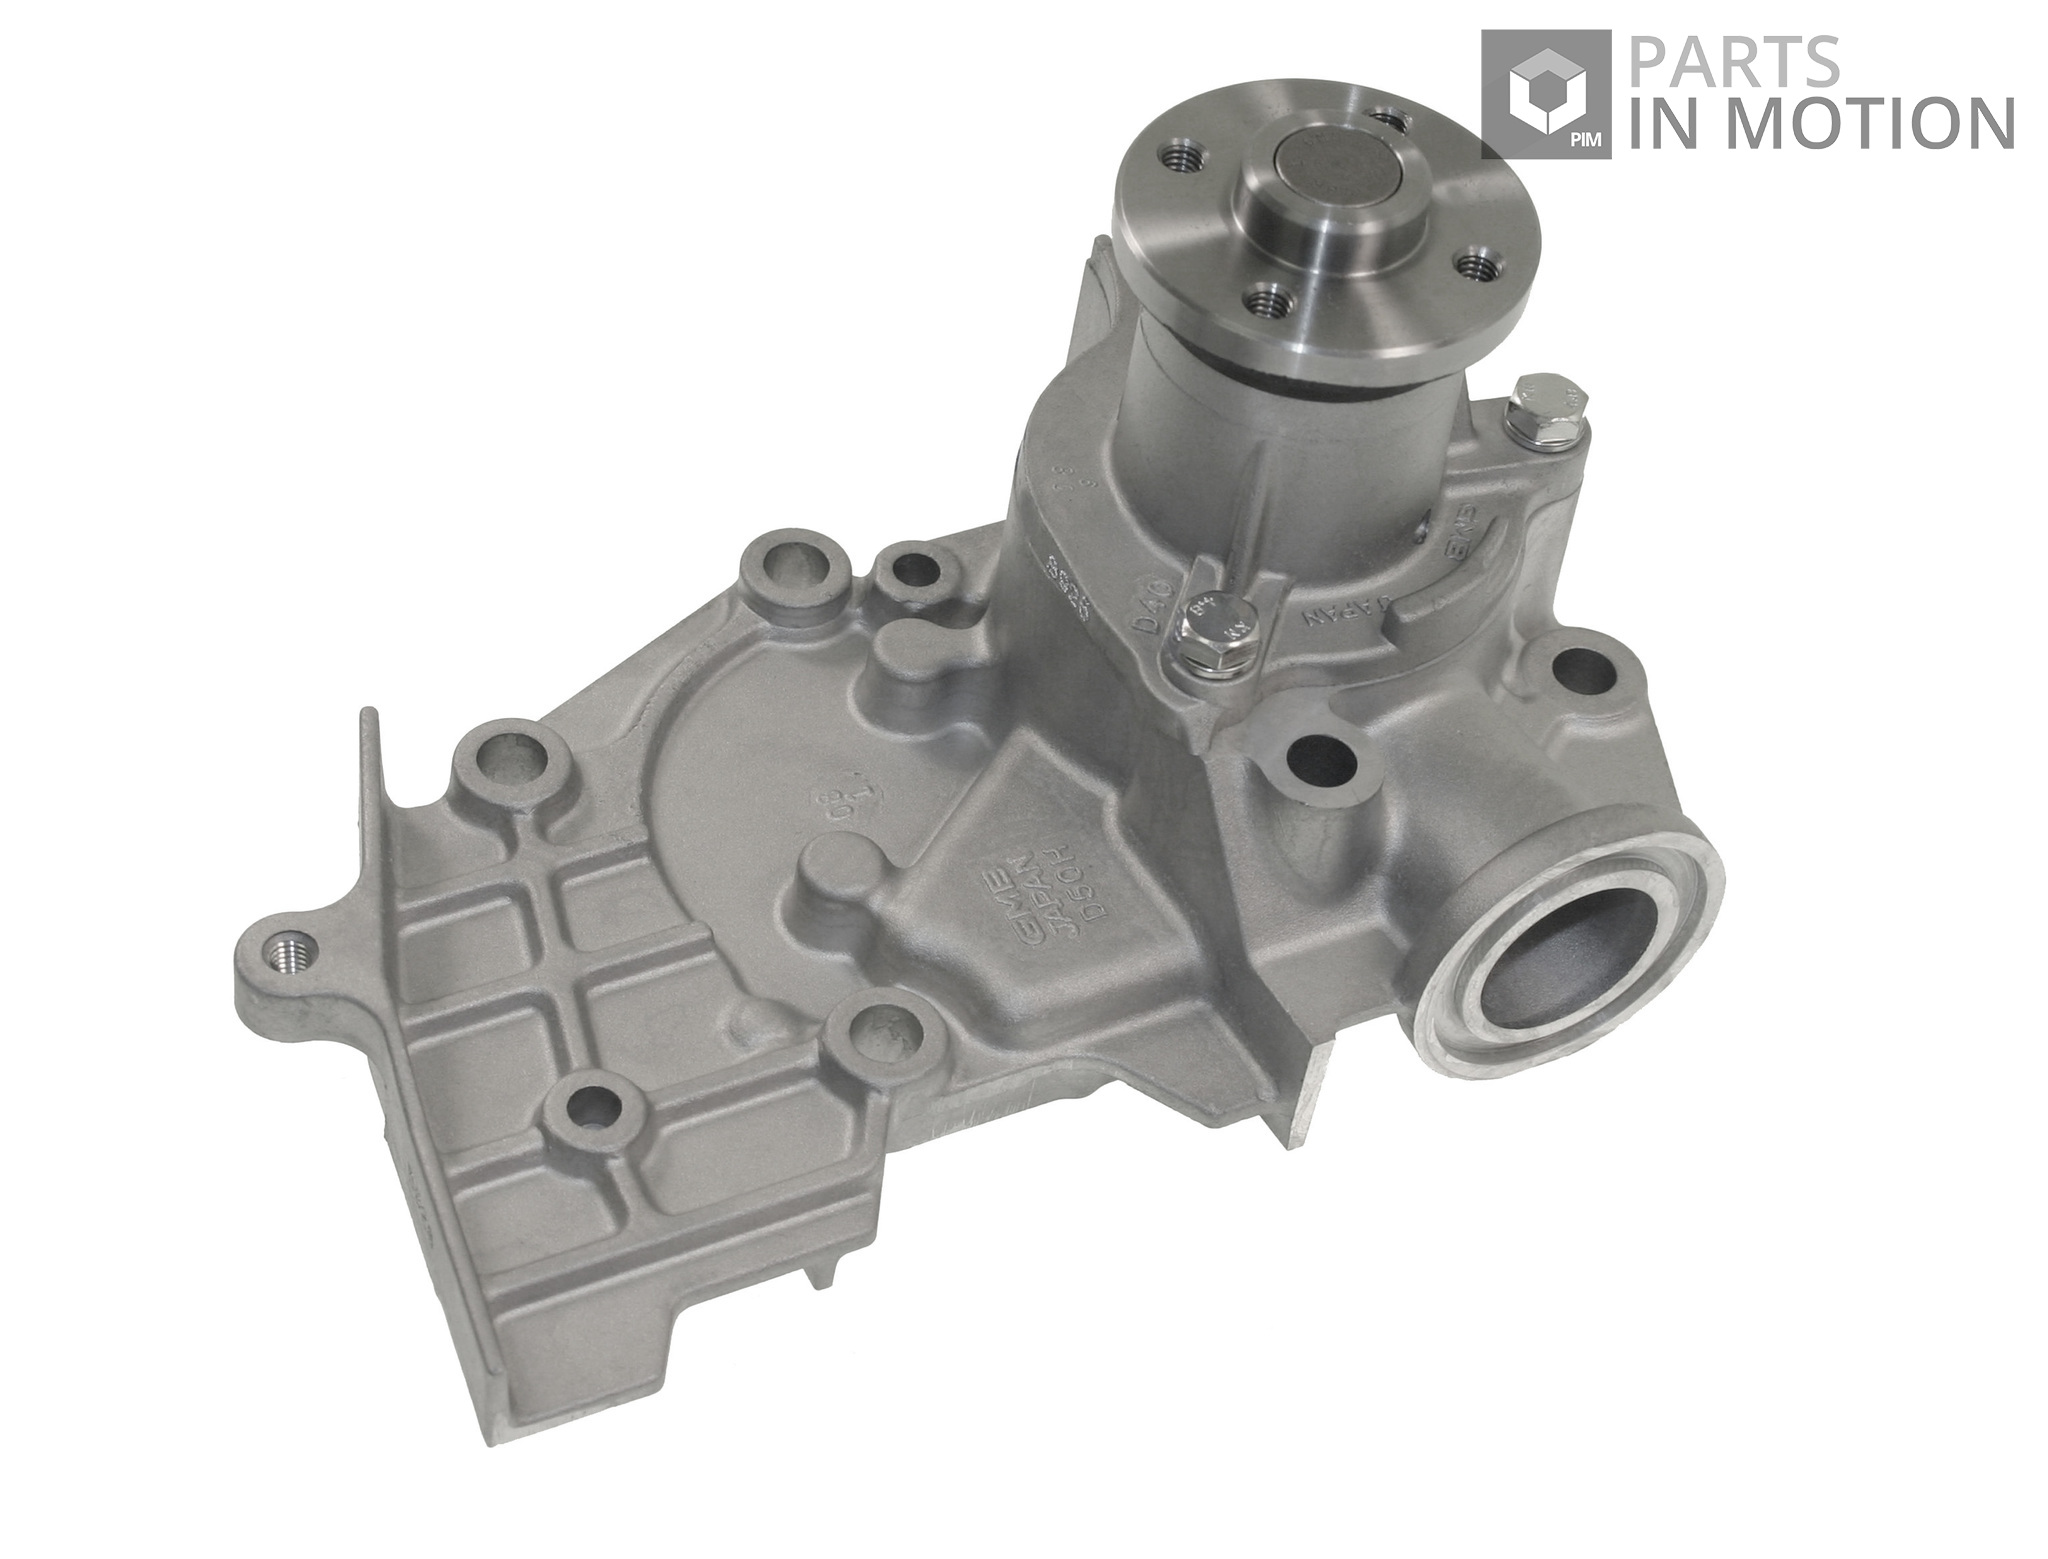 Water Pump Fits DAIHATSU CUORE Mk5 1.0 98 To 03 Coolant